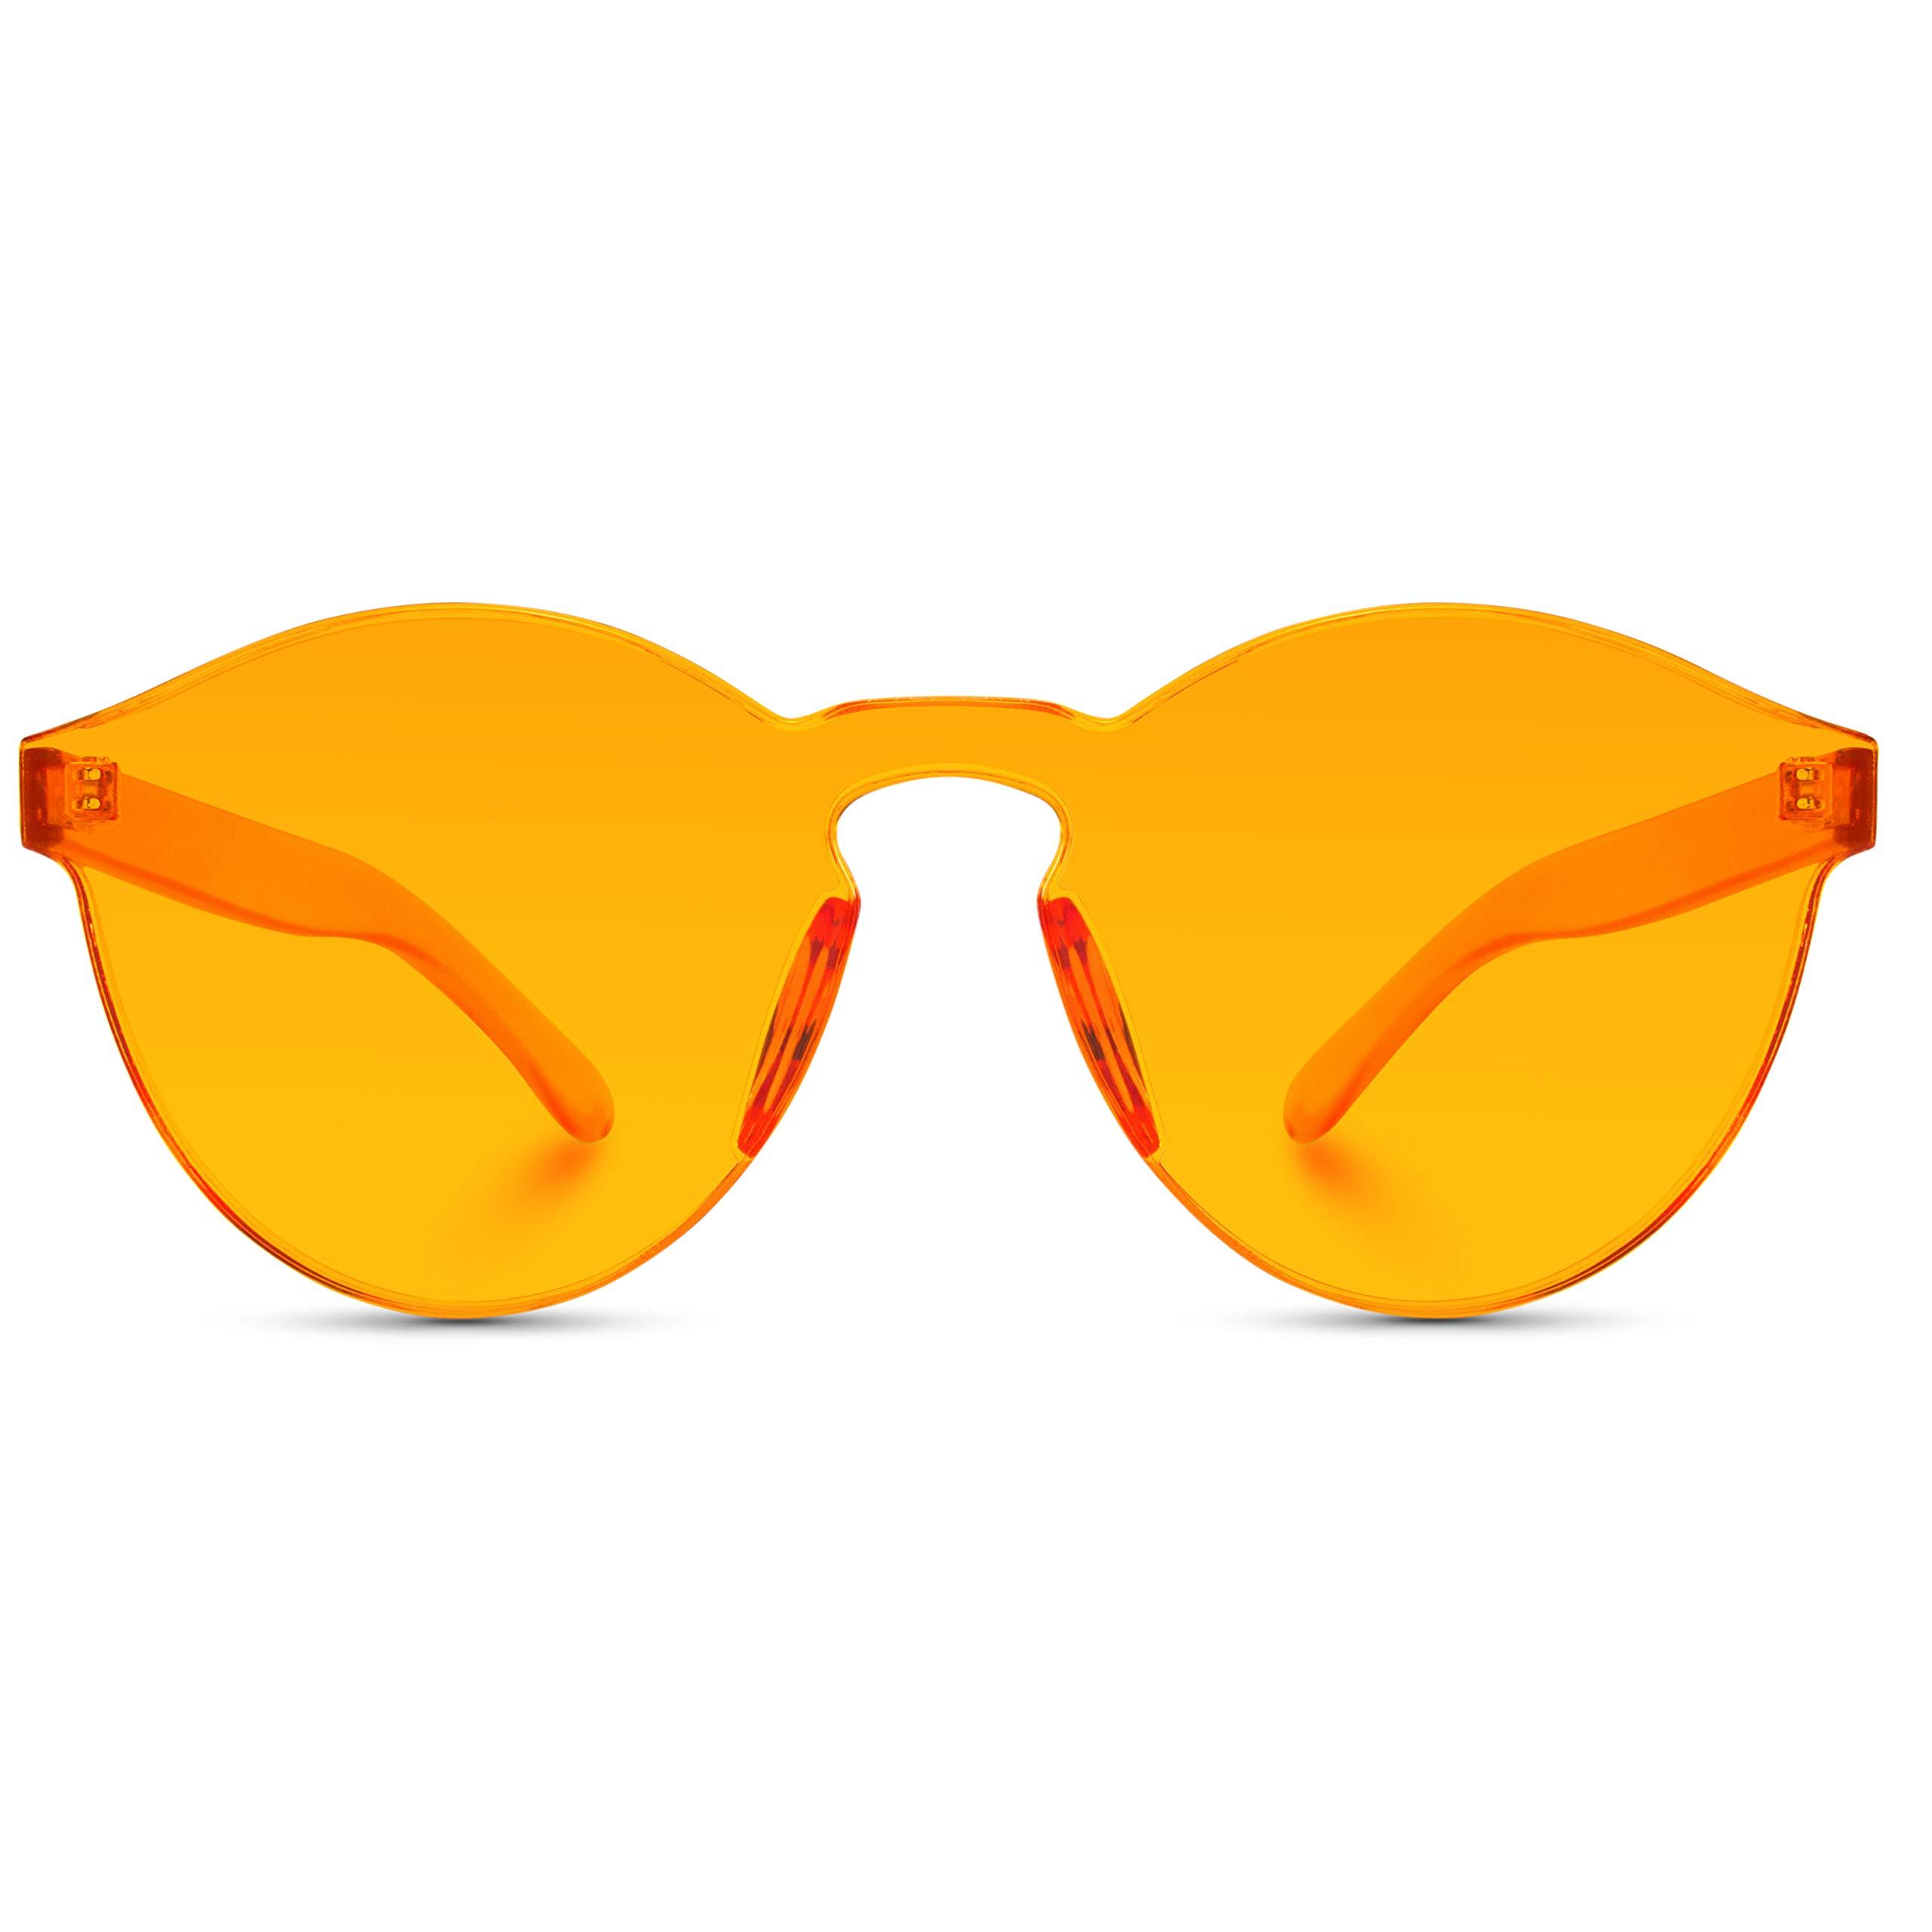 WearMe Pro - Colorful Transparent Round Super Retro Sunglasses (Orange, 59) by WearMe Pro